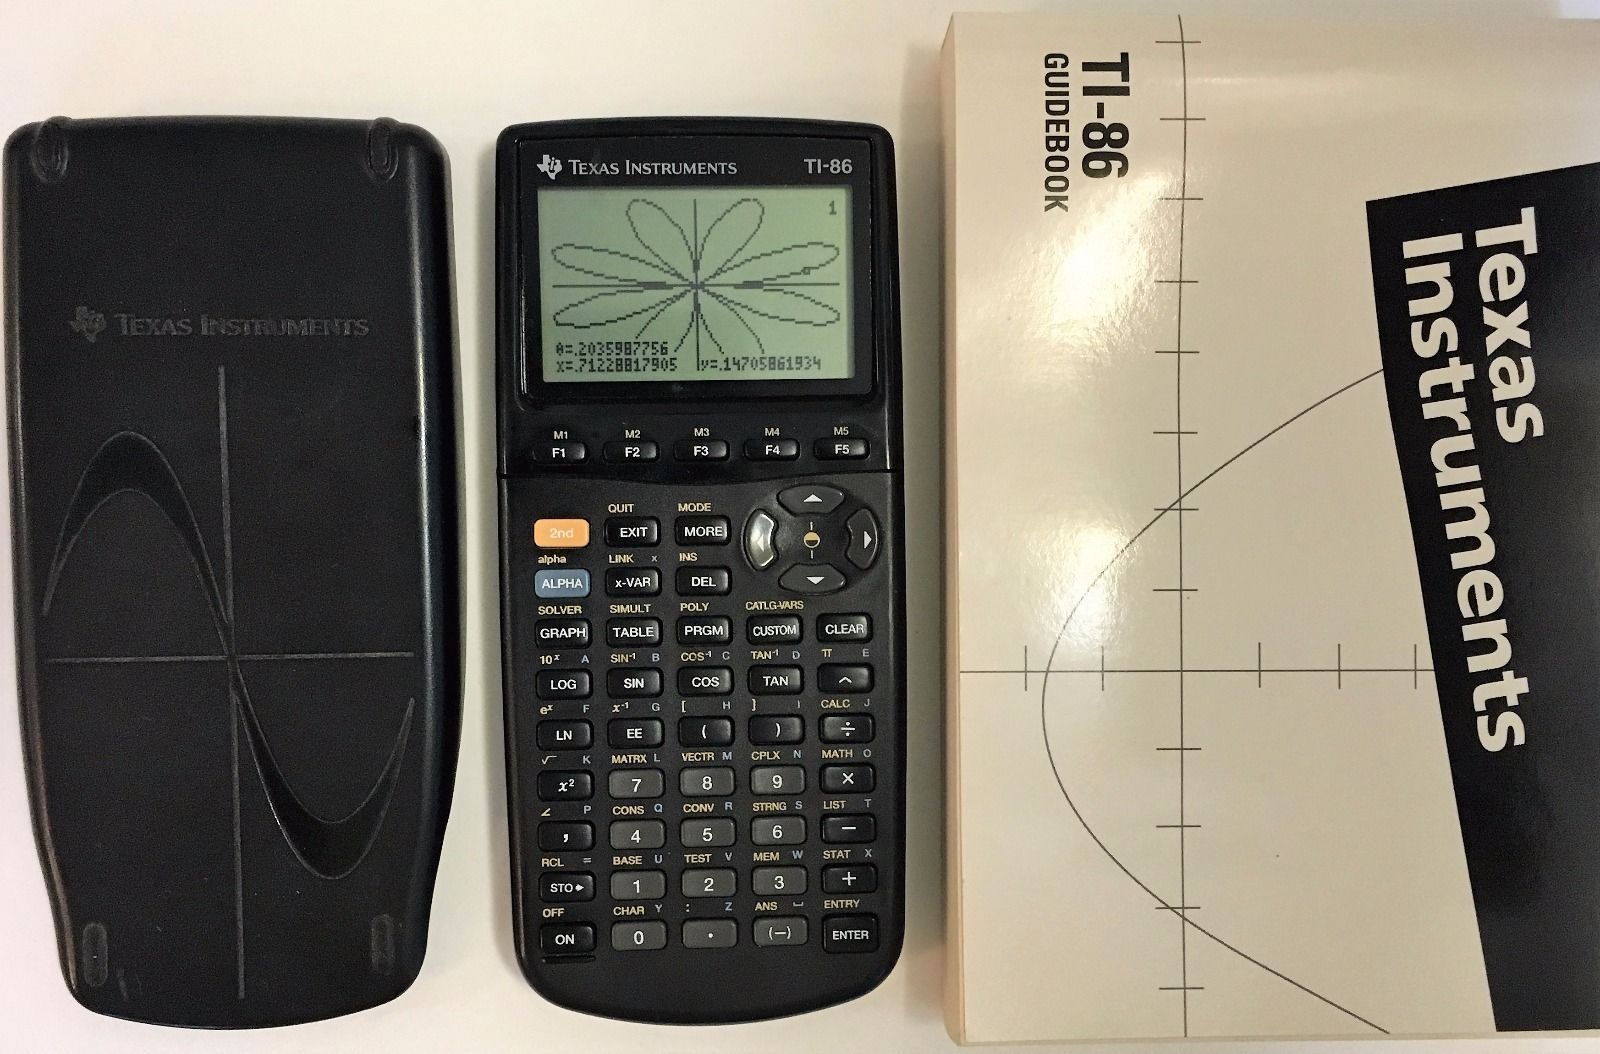 texas instruments ti 86 graphing calculator and guidebook manual rh pinterest com ti 86 manuel d'utilisation ti 86 manual free download